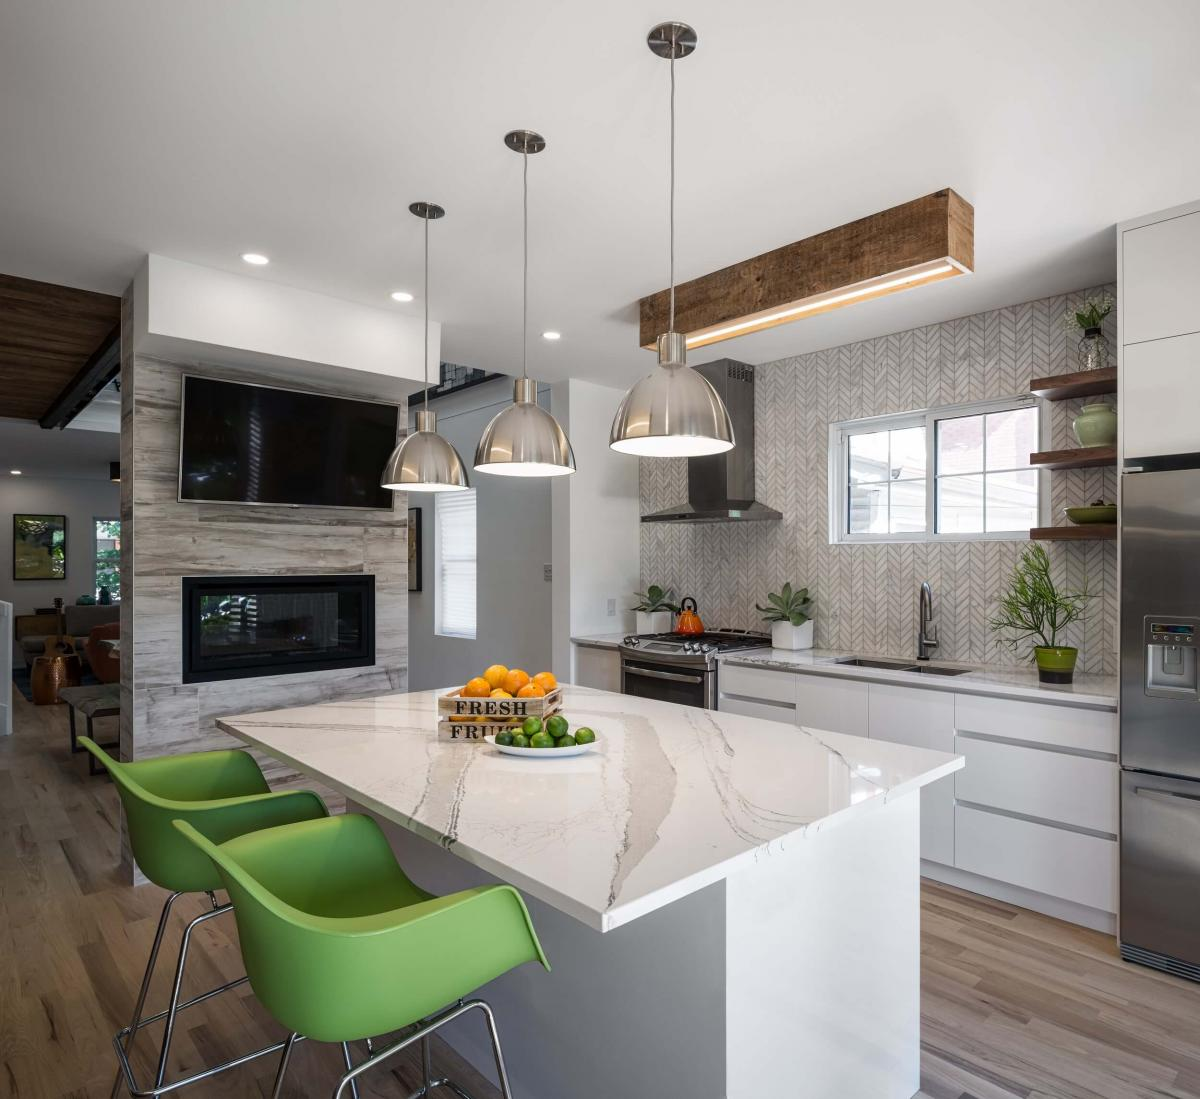 Kitchen Renovation Hamilton Ontario: Cedar Ridge Designs & Custom Cabinetry